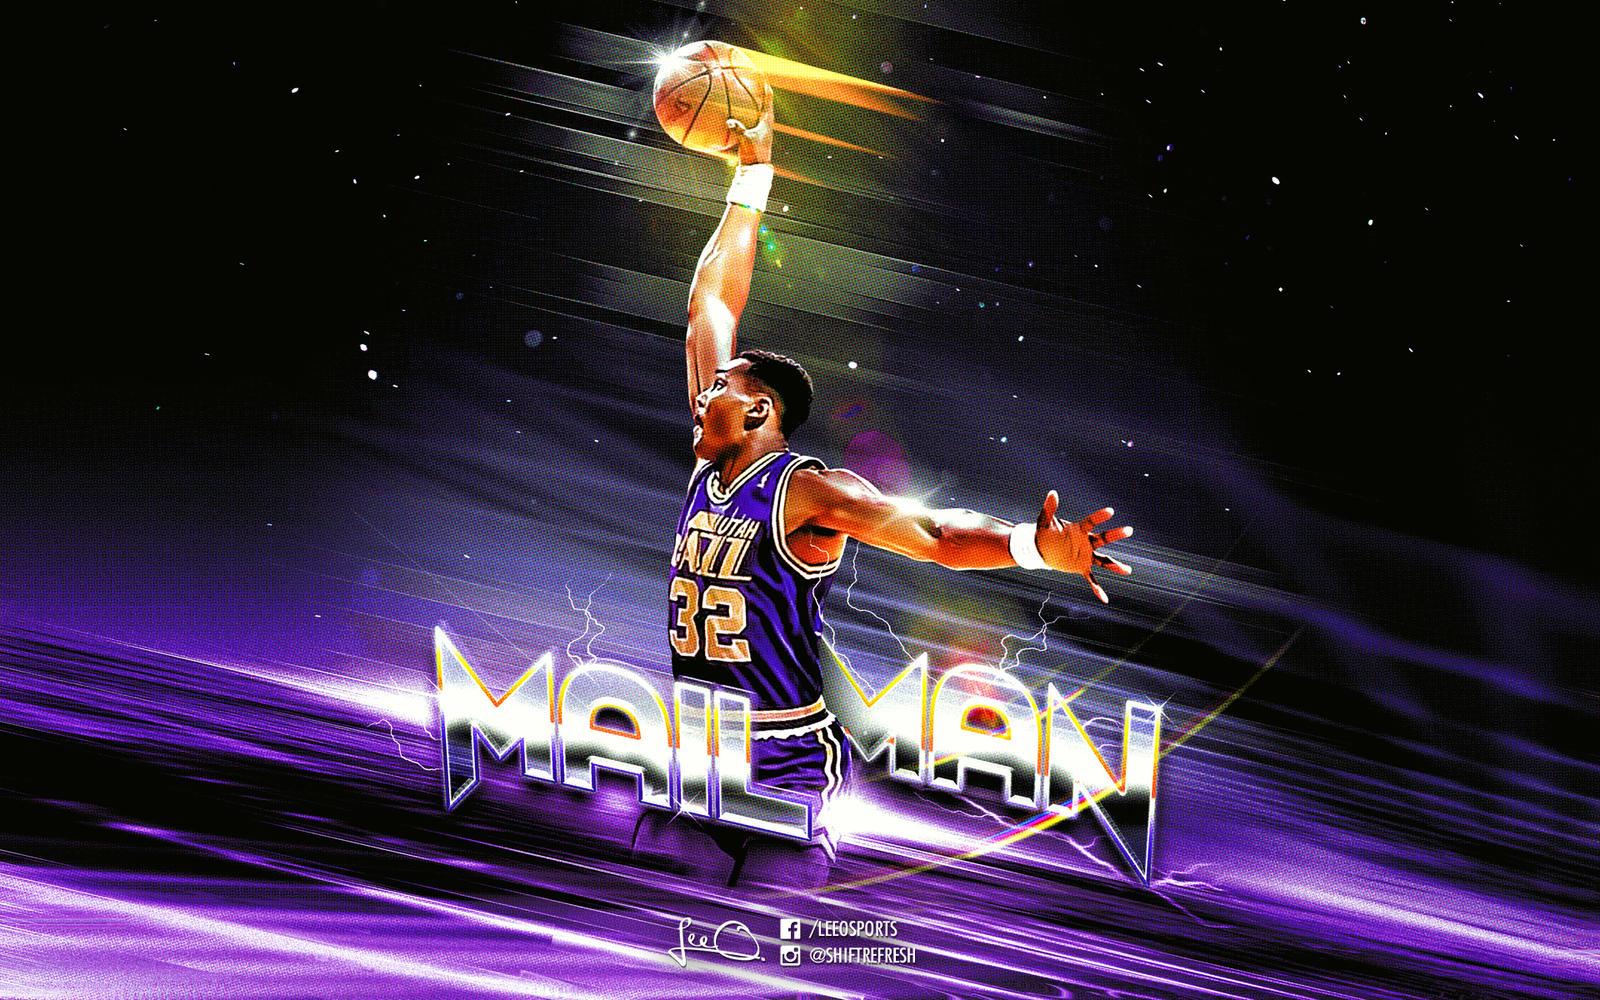 Karl Malone Mailmain NBA wallpaper by skythlee on DeviantArt